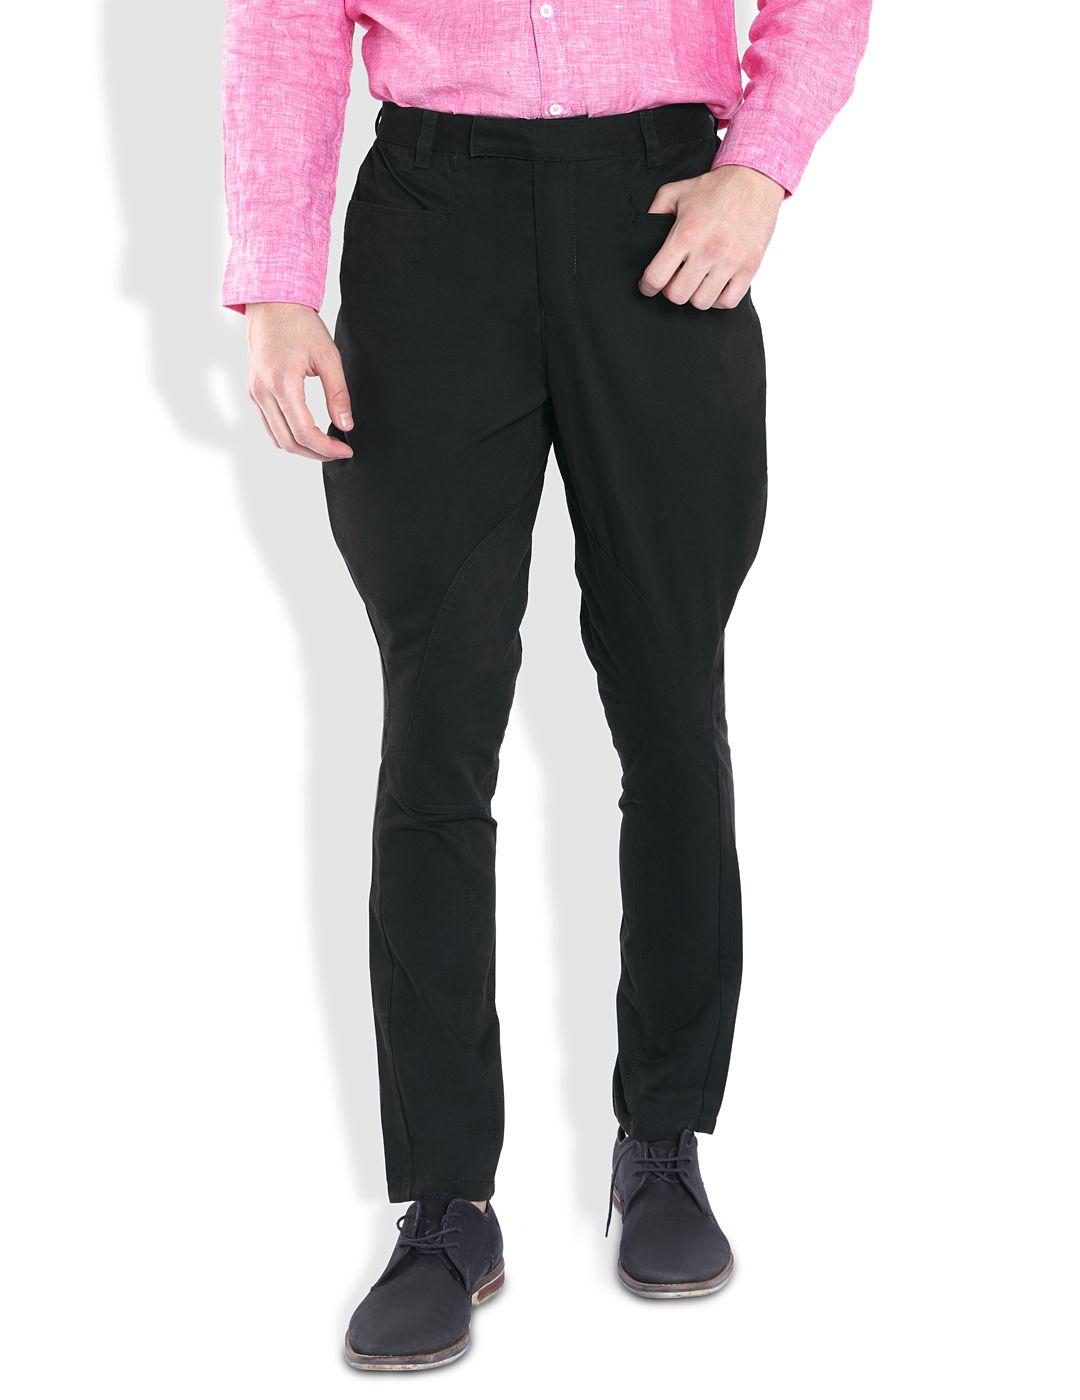 Parx Black Regular Fit Flat Trousers